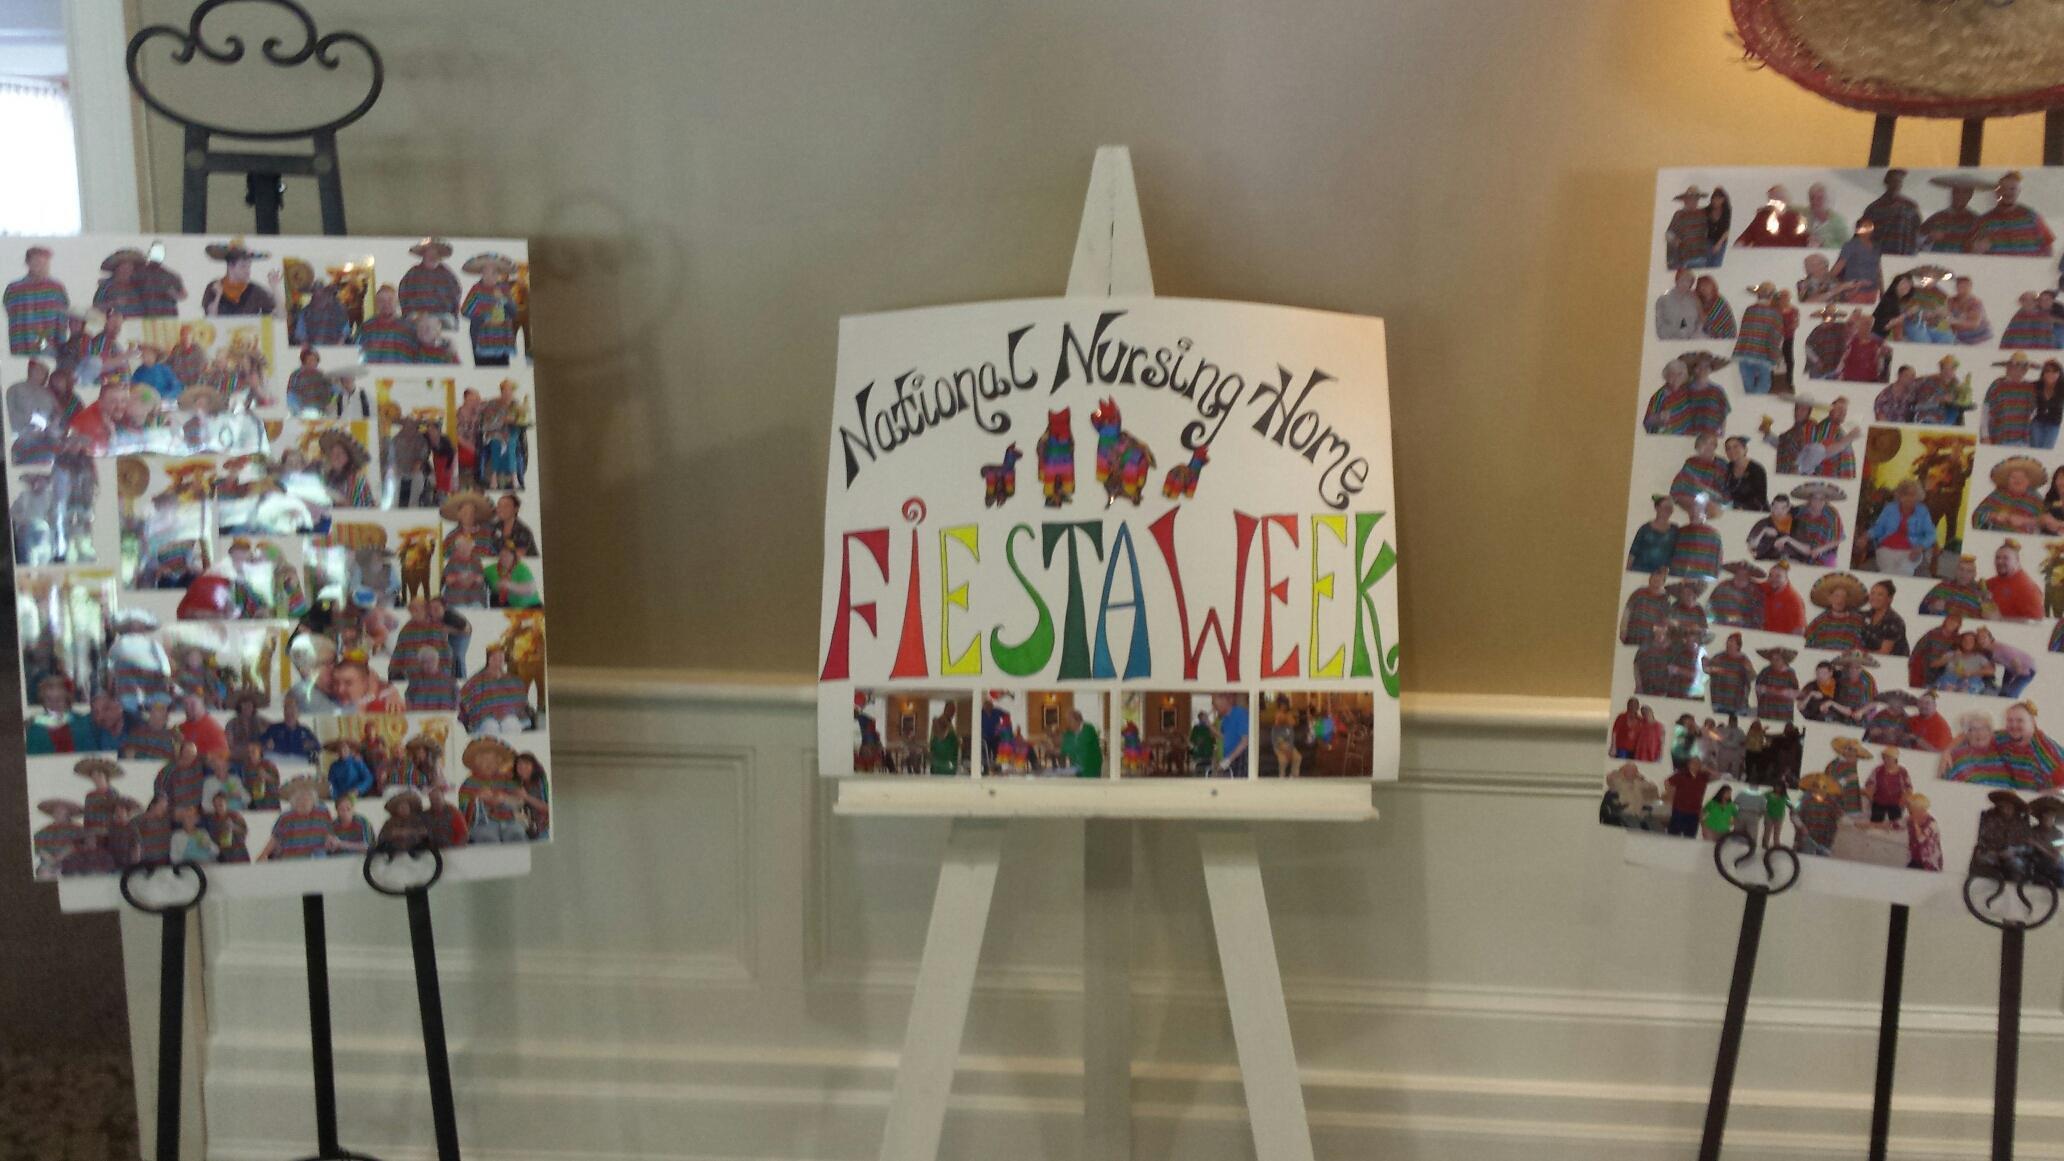 Edgewood Manor celebrates Fiesta Week!